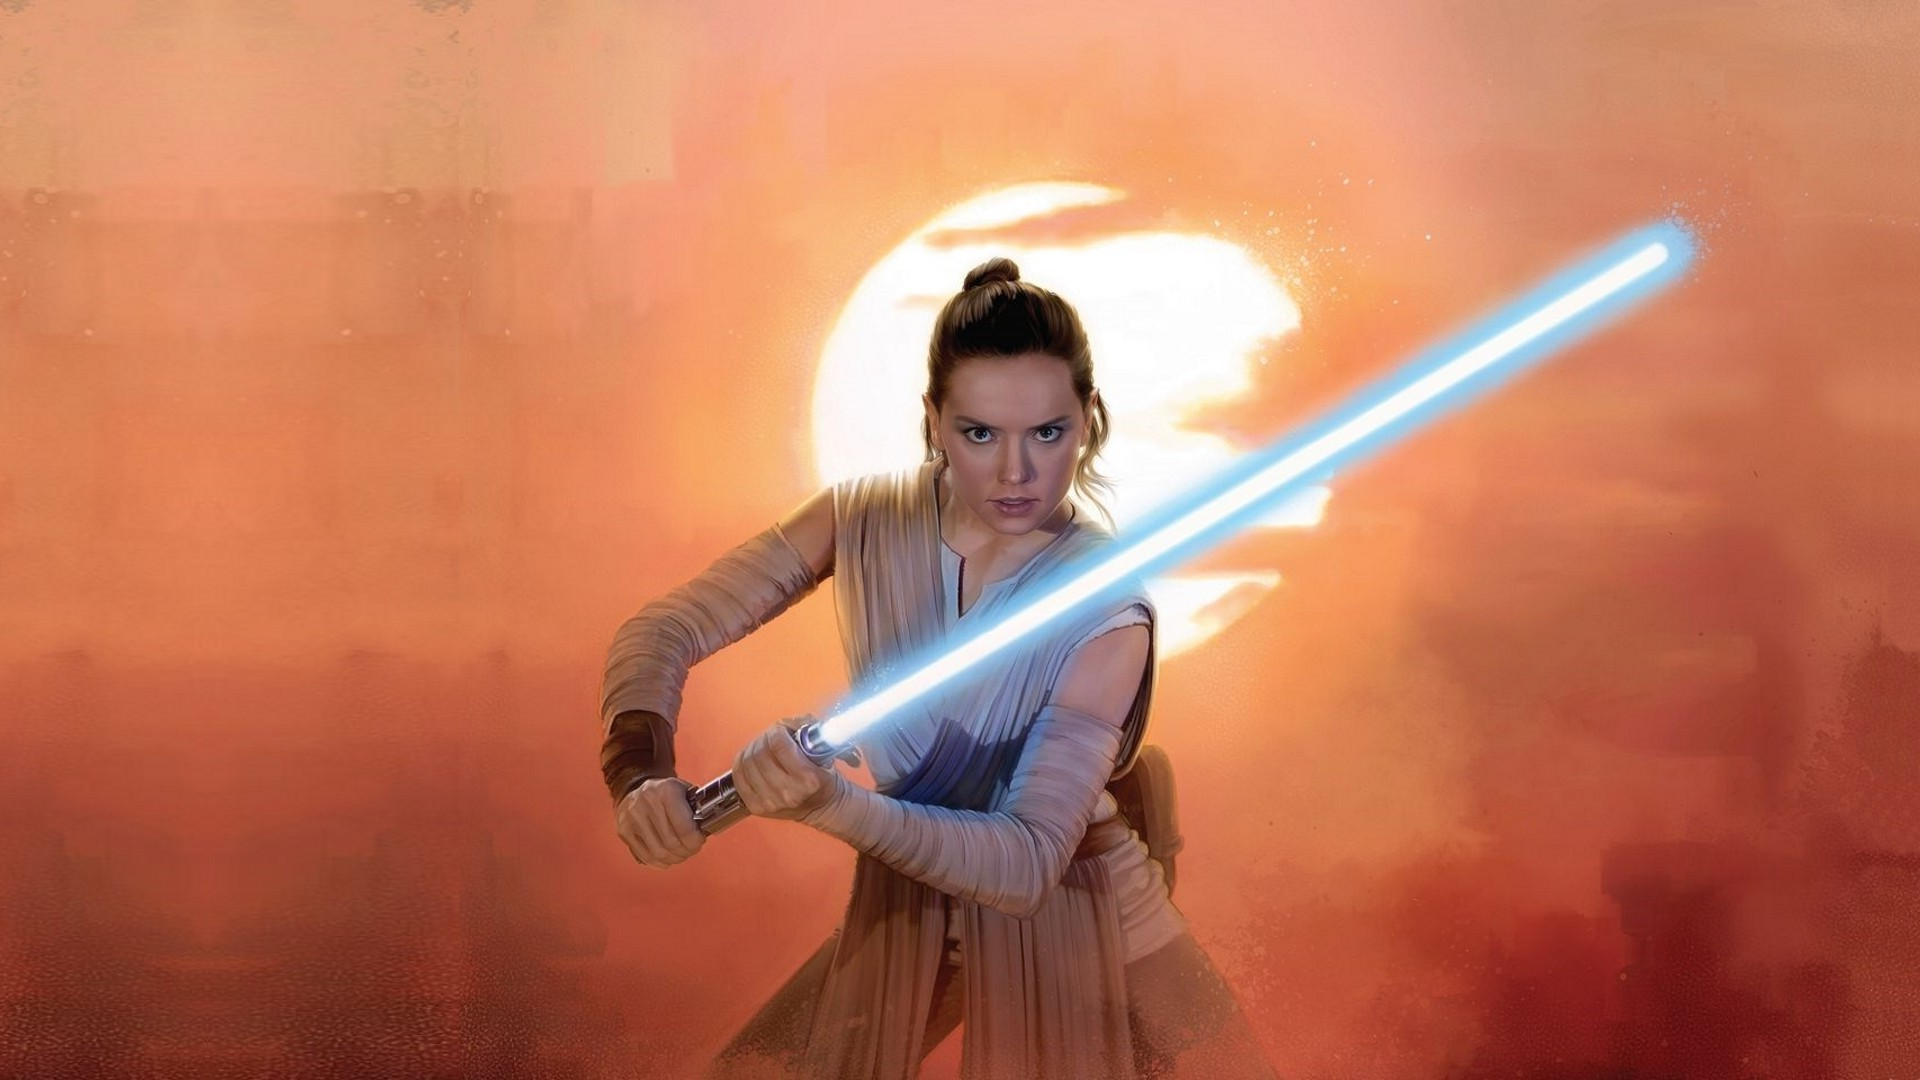 Daisy Ridley Rey Star Wars Lightsaber Jedi Wallpapers Star Wars Rey Wallpaper Hd 1920x1080 Download Hd Wallpaper Wallpapertip